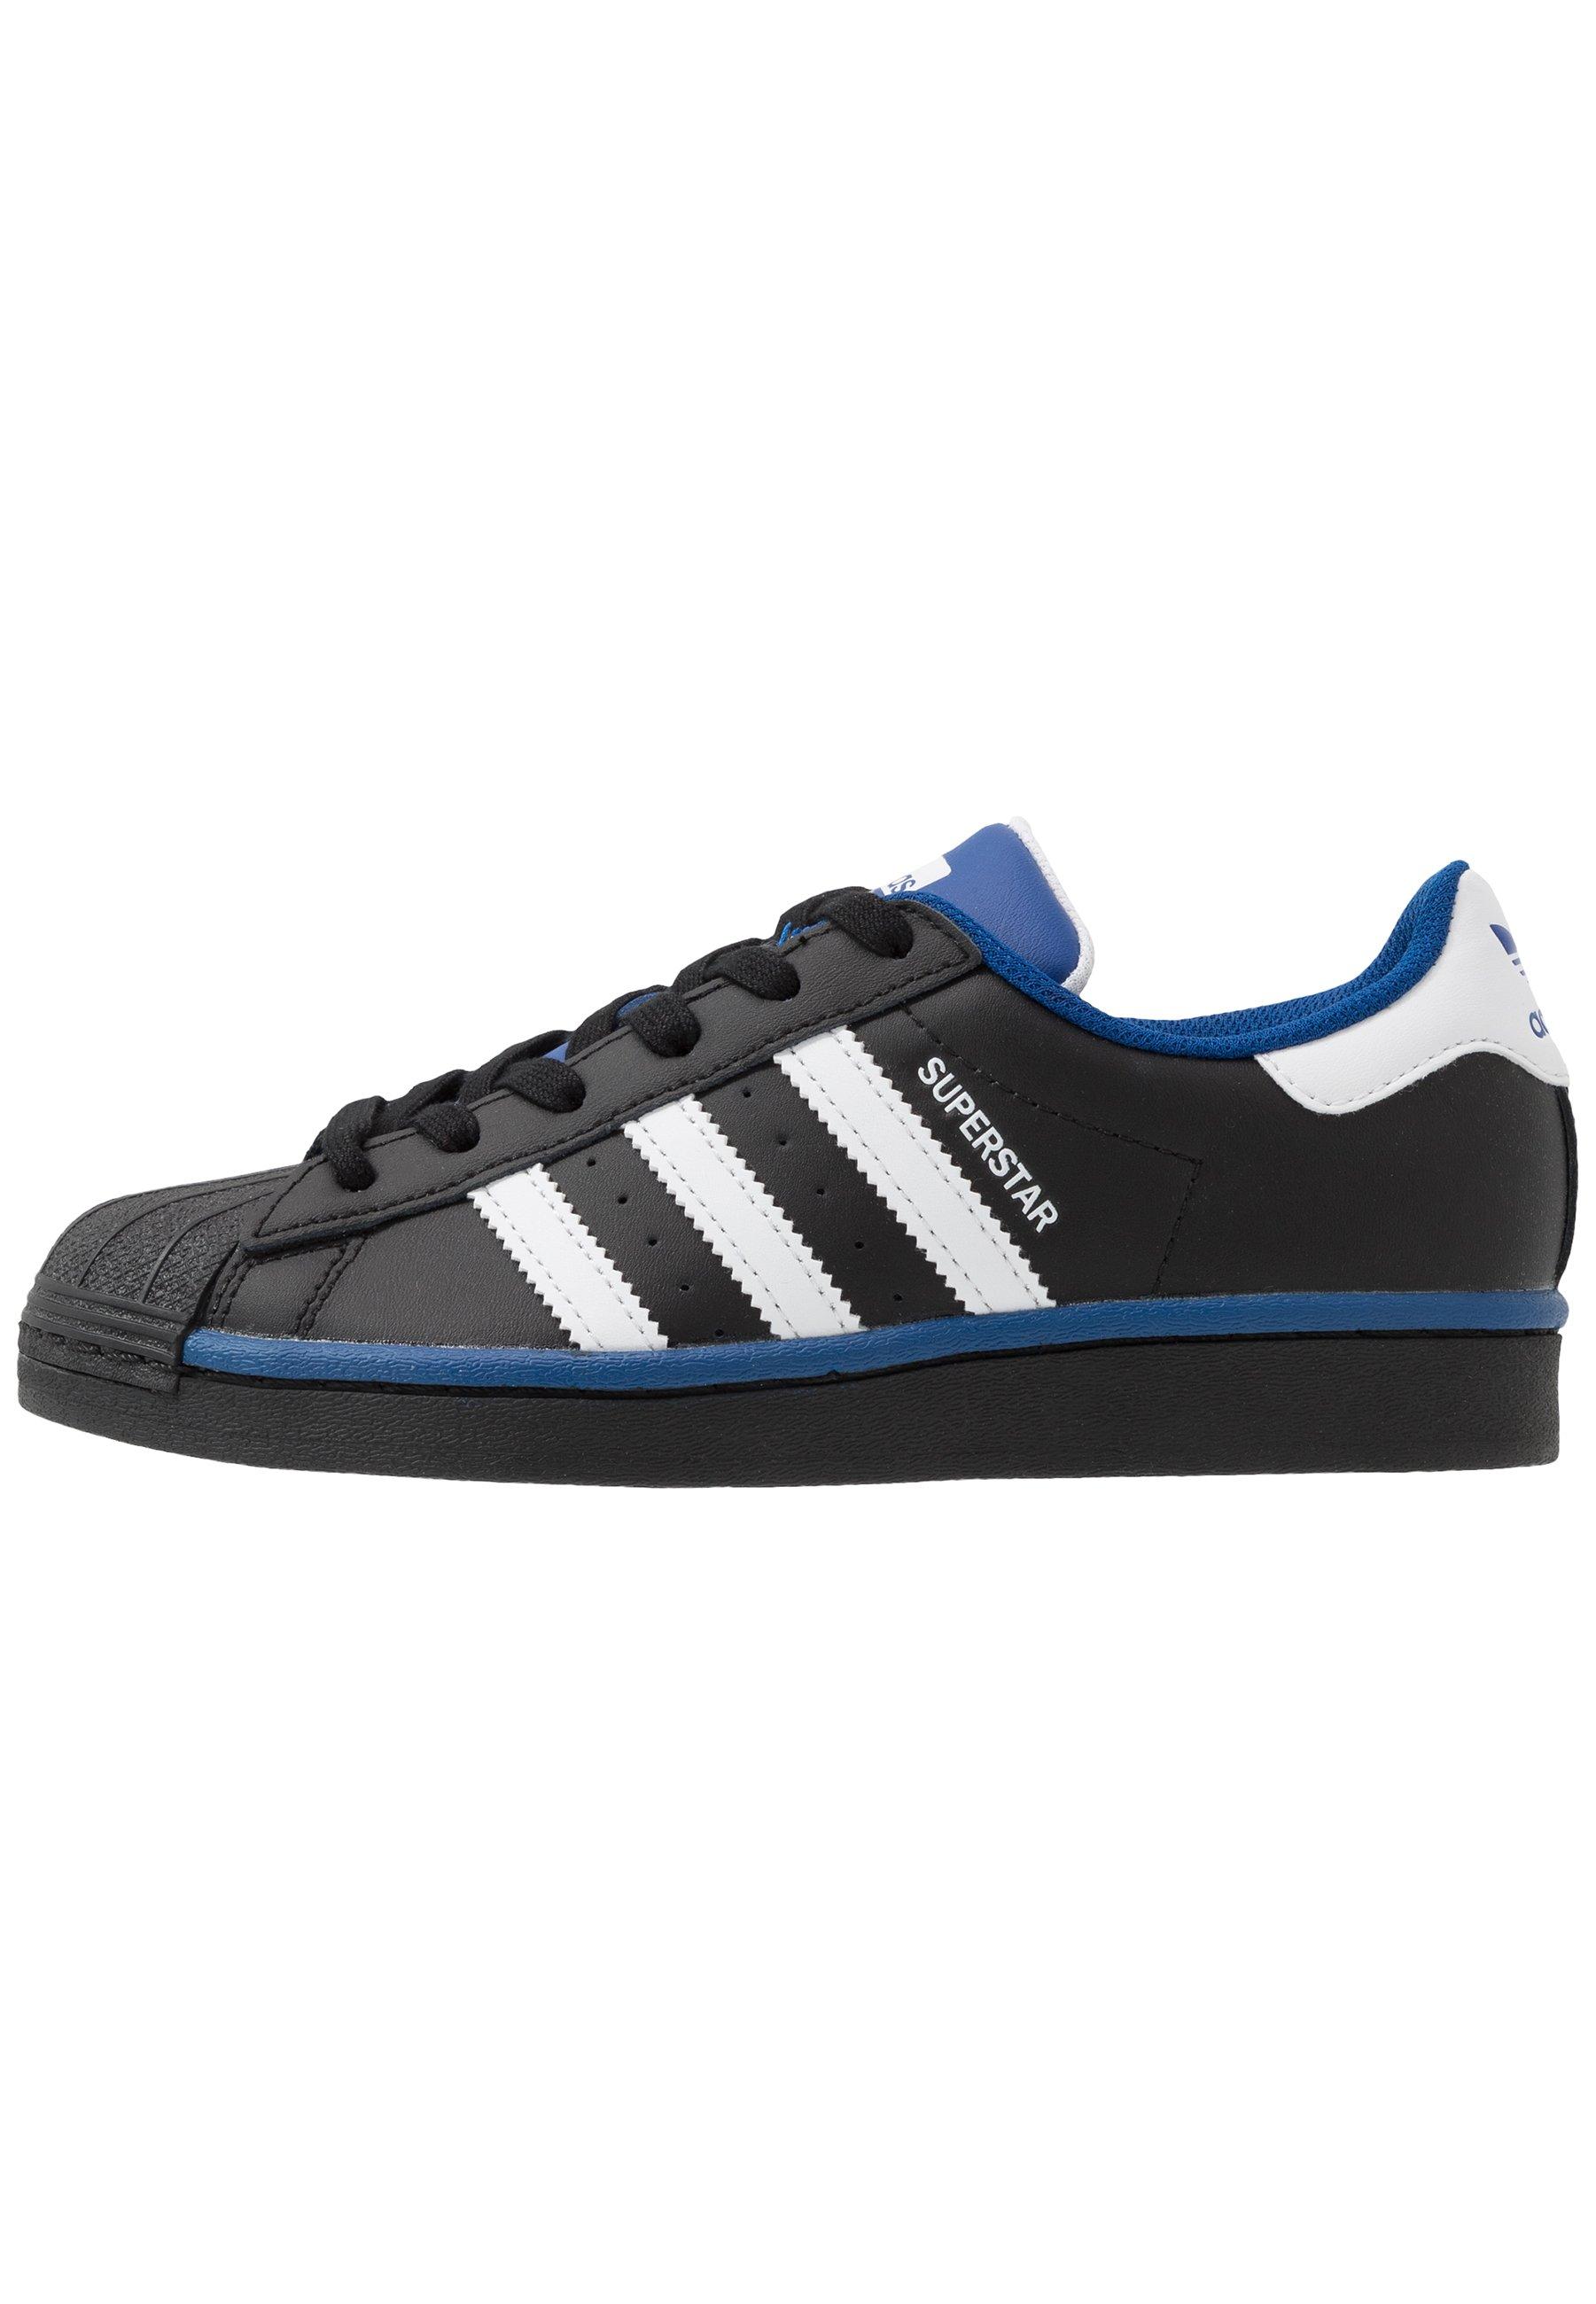 adidas Originals SUPERSTAR Sneakers laag core black